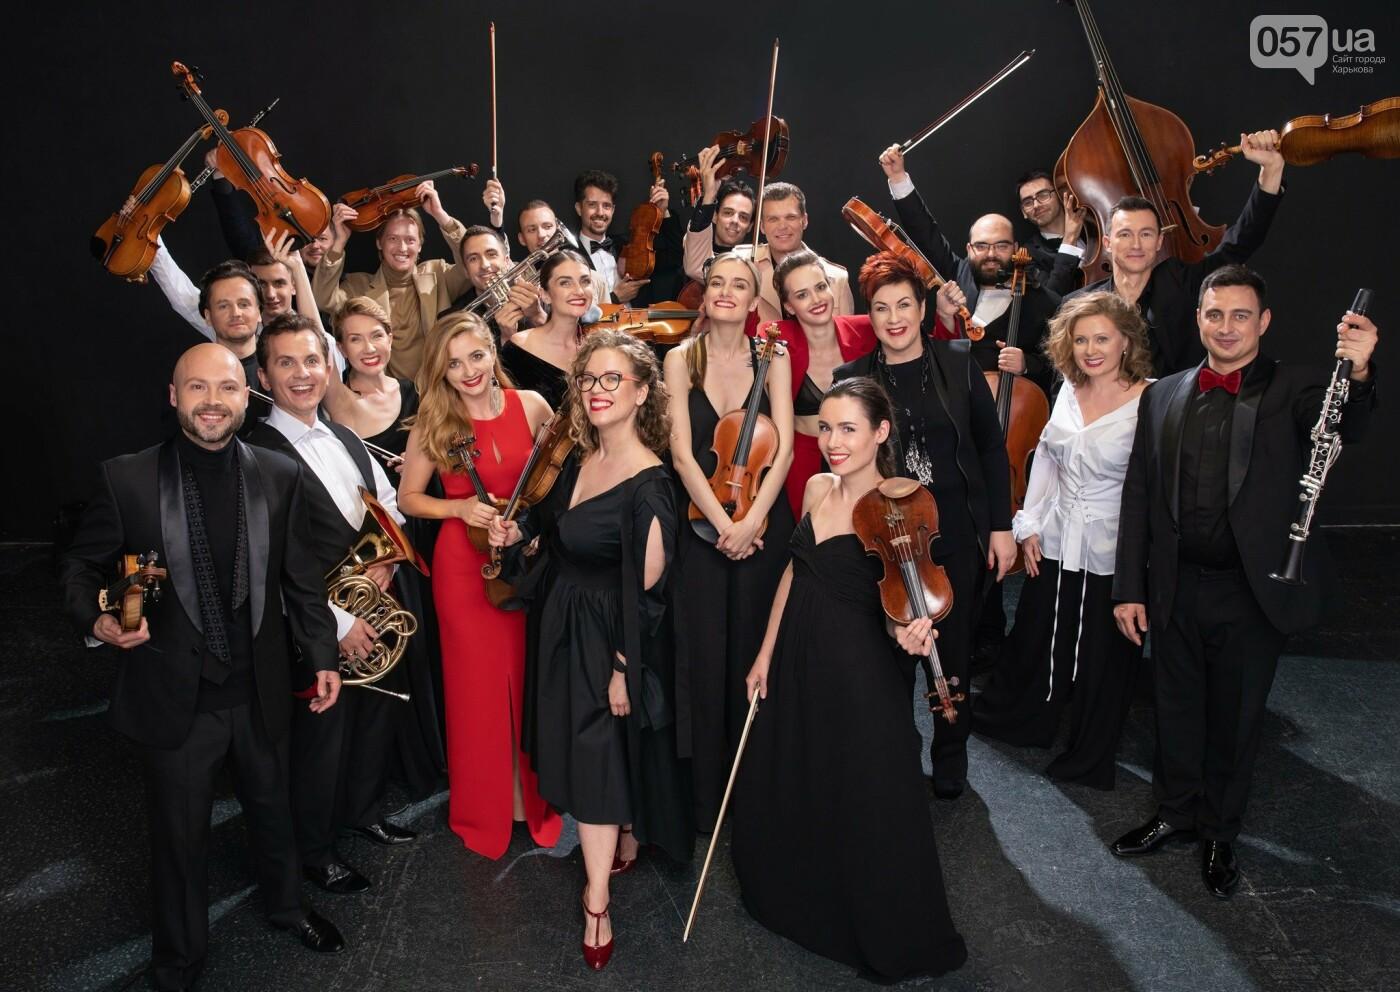 Харьков приглашает на Kharkiv Music Fest, фото-5